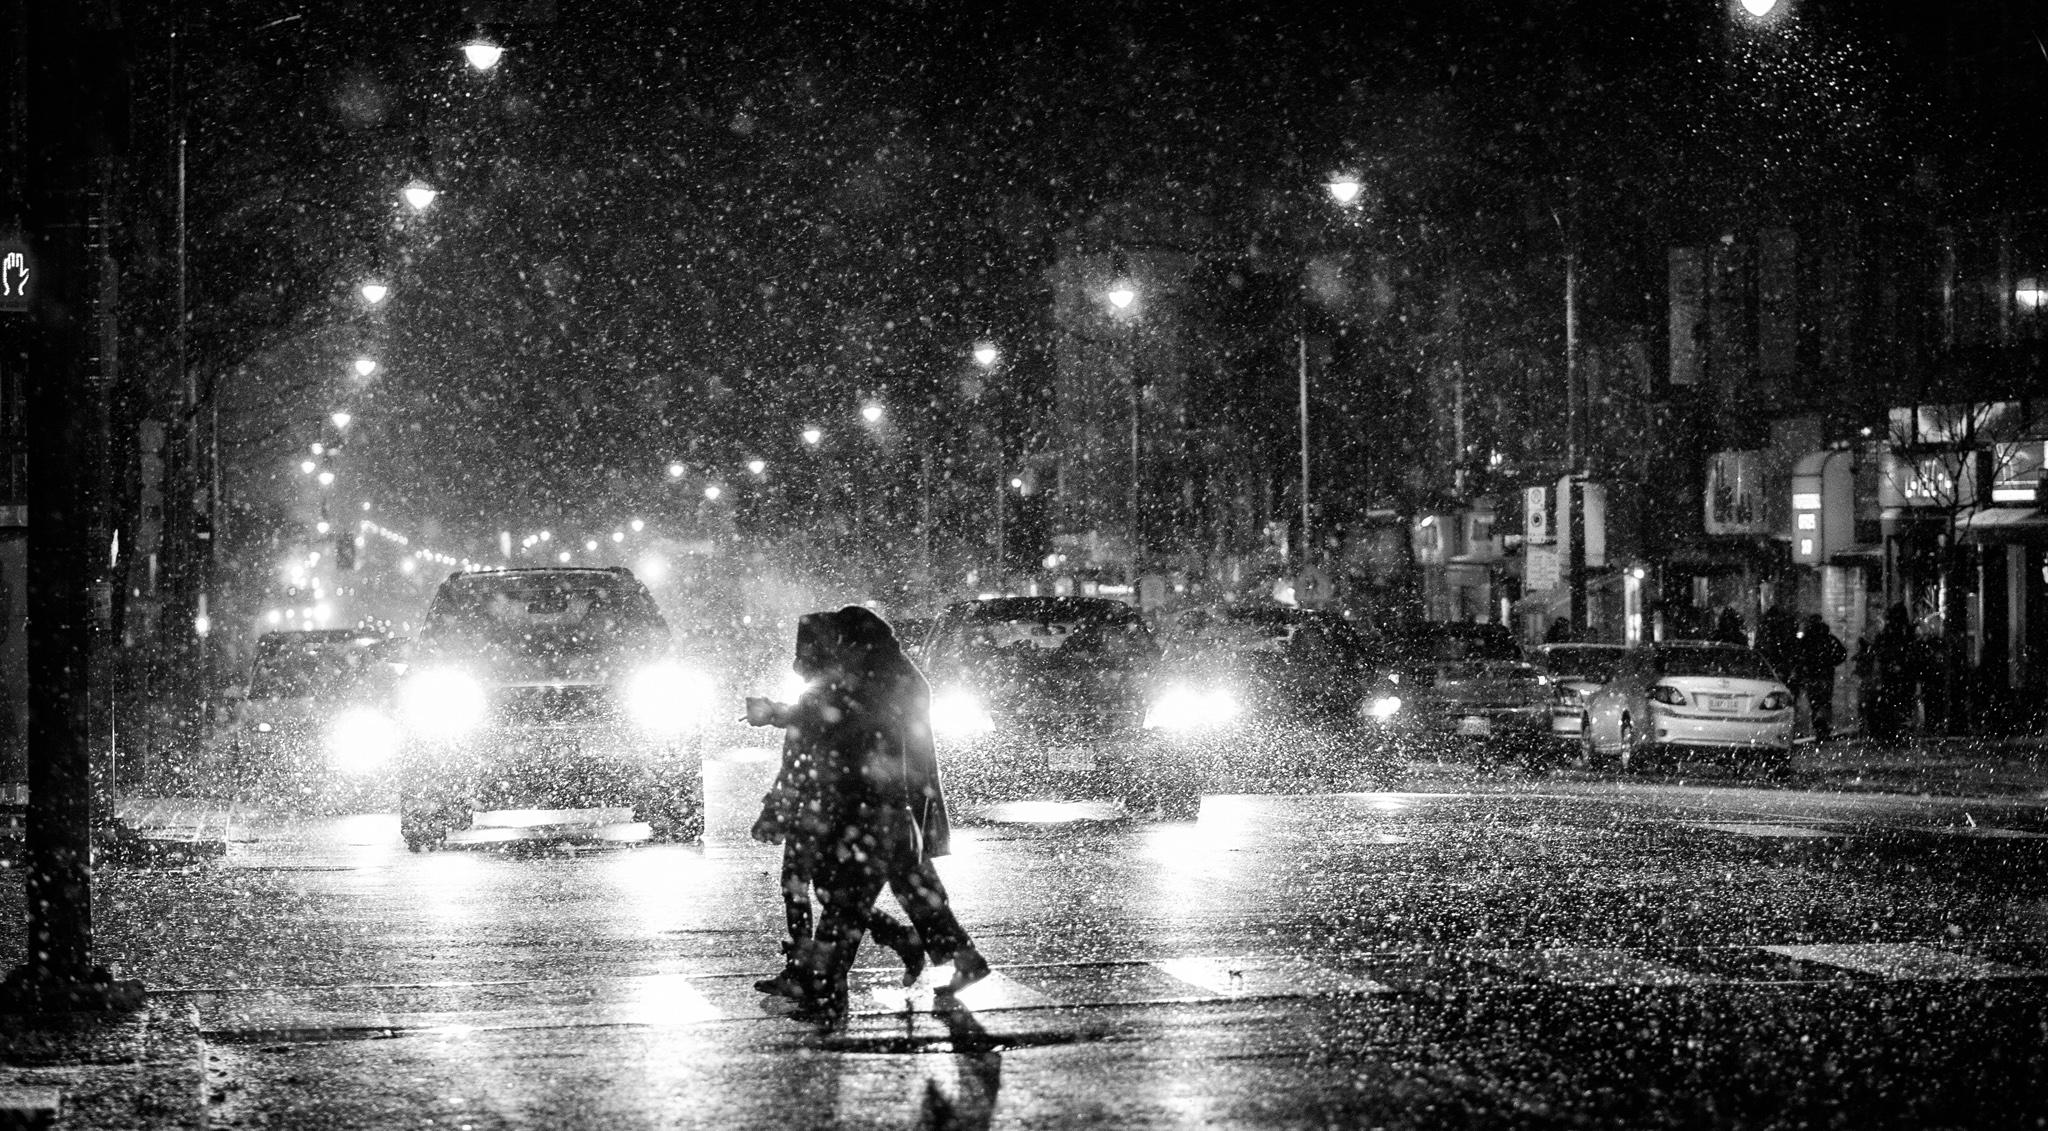 snowy-intersection_yonge-eglinton_bw_01.jpg